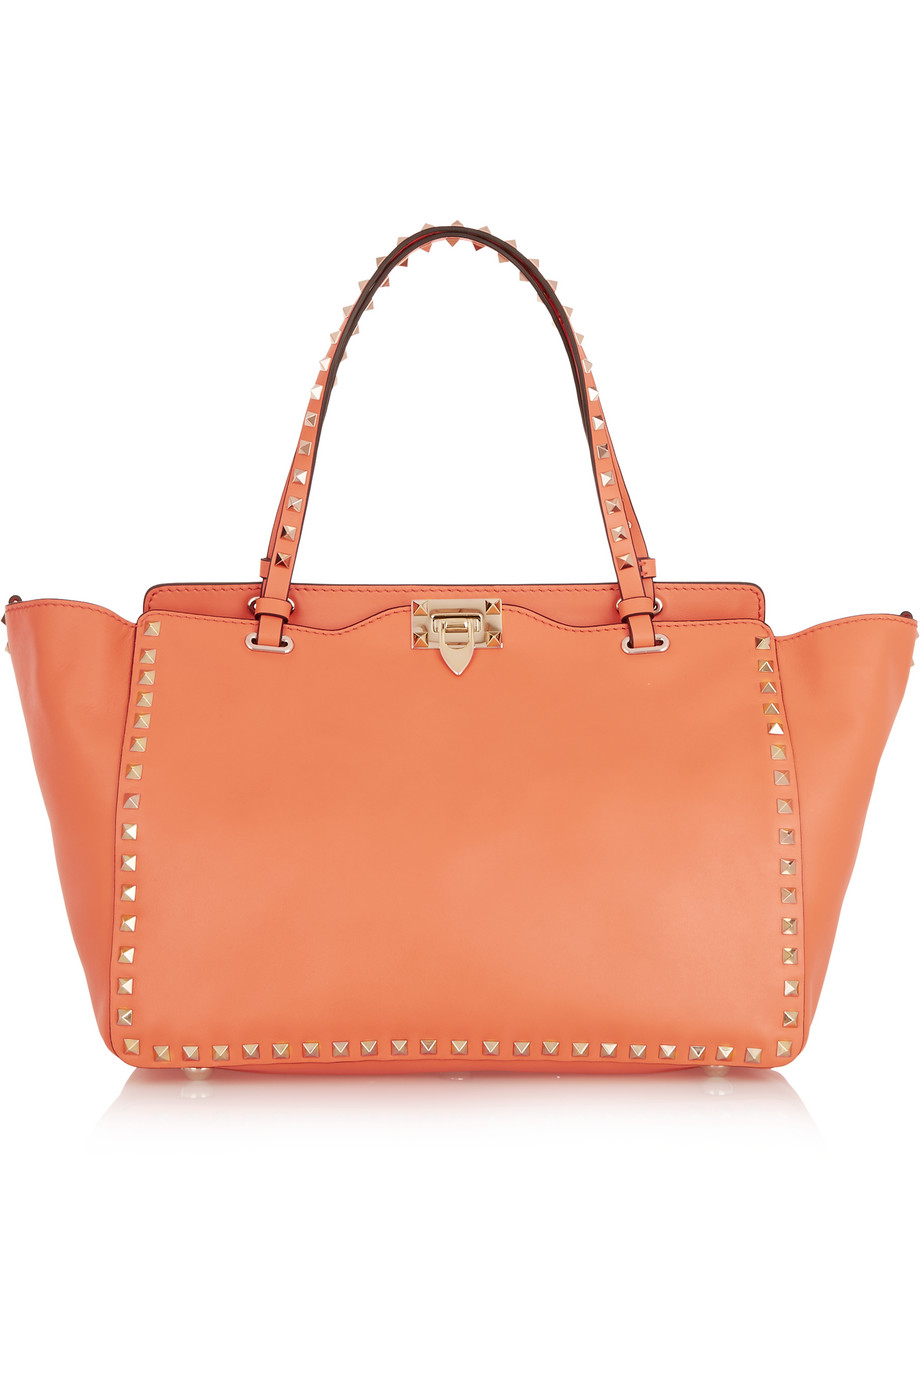 Valentino The Rockstud Medium Leather Tote, Orange, Women's